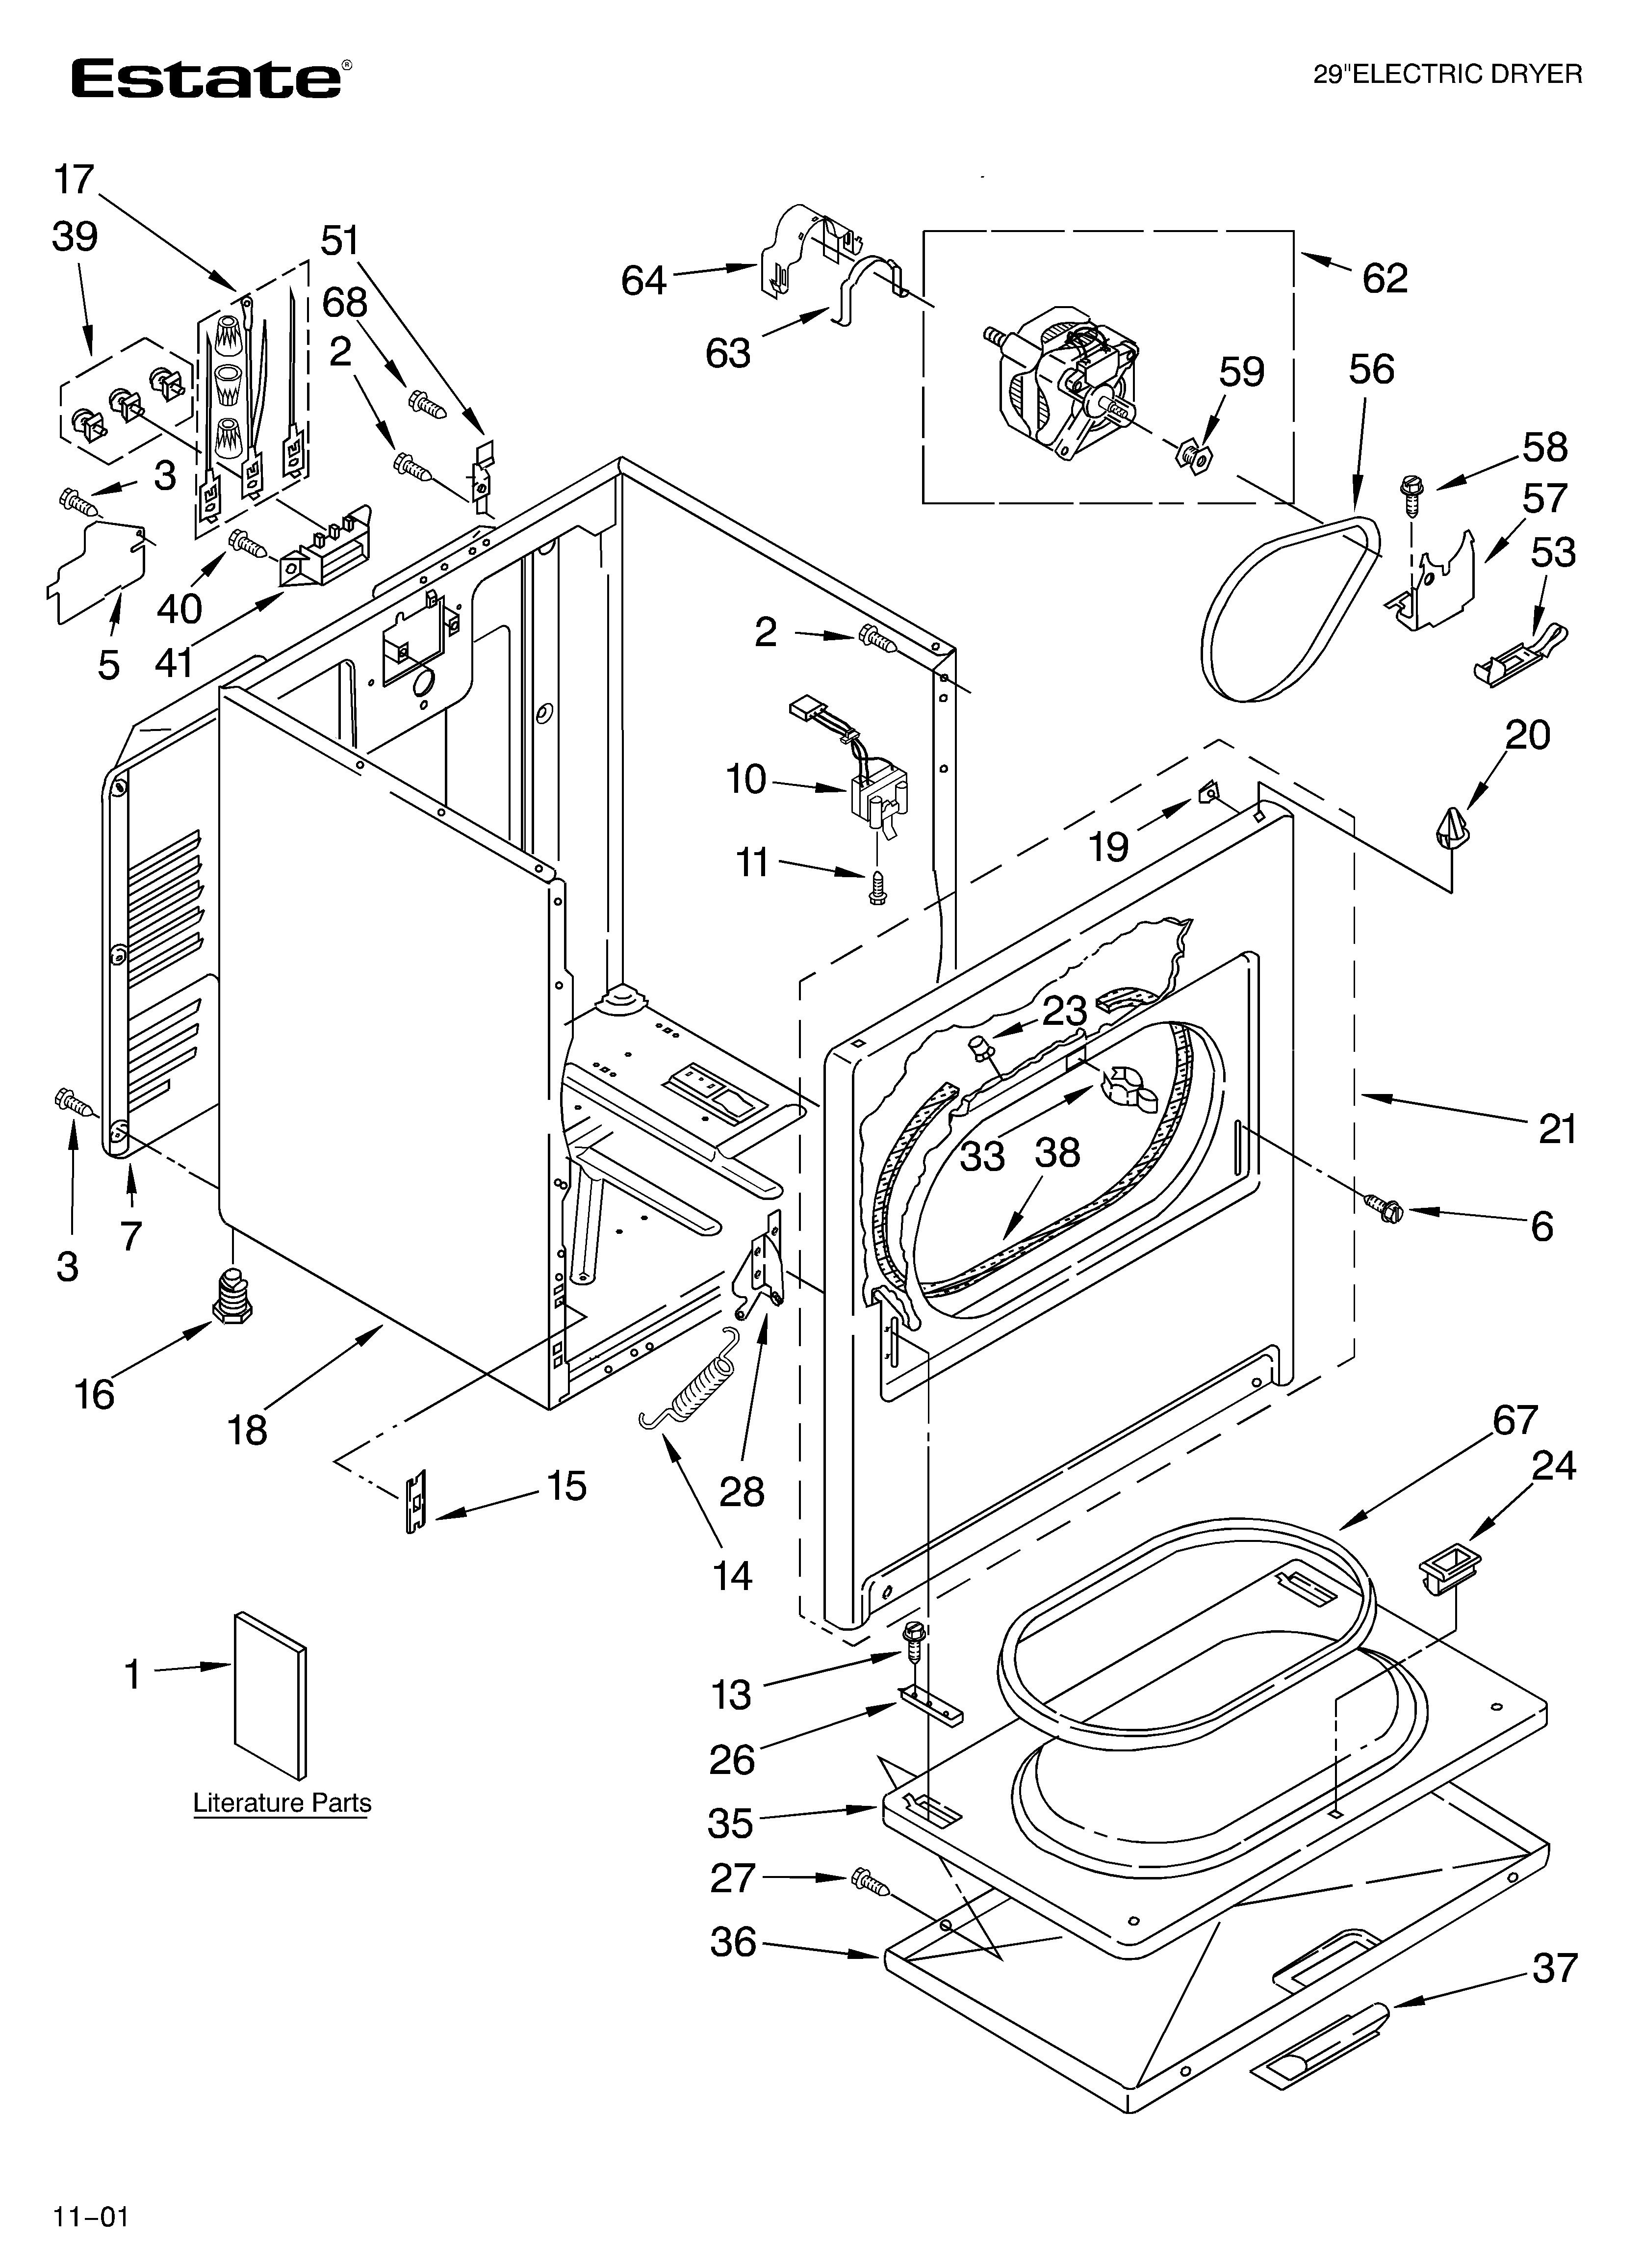 model wiring whirlpool diagram et1phkxpq00 wiring diagram  model wiring whirlpool diagram dryer ler7646aw2 1 19model wiring whirlpool diagram dryer ler7646aw2 wiring schematic rh